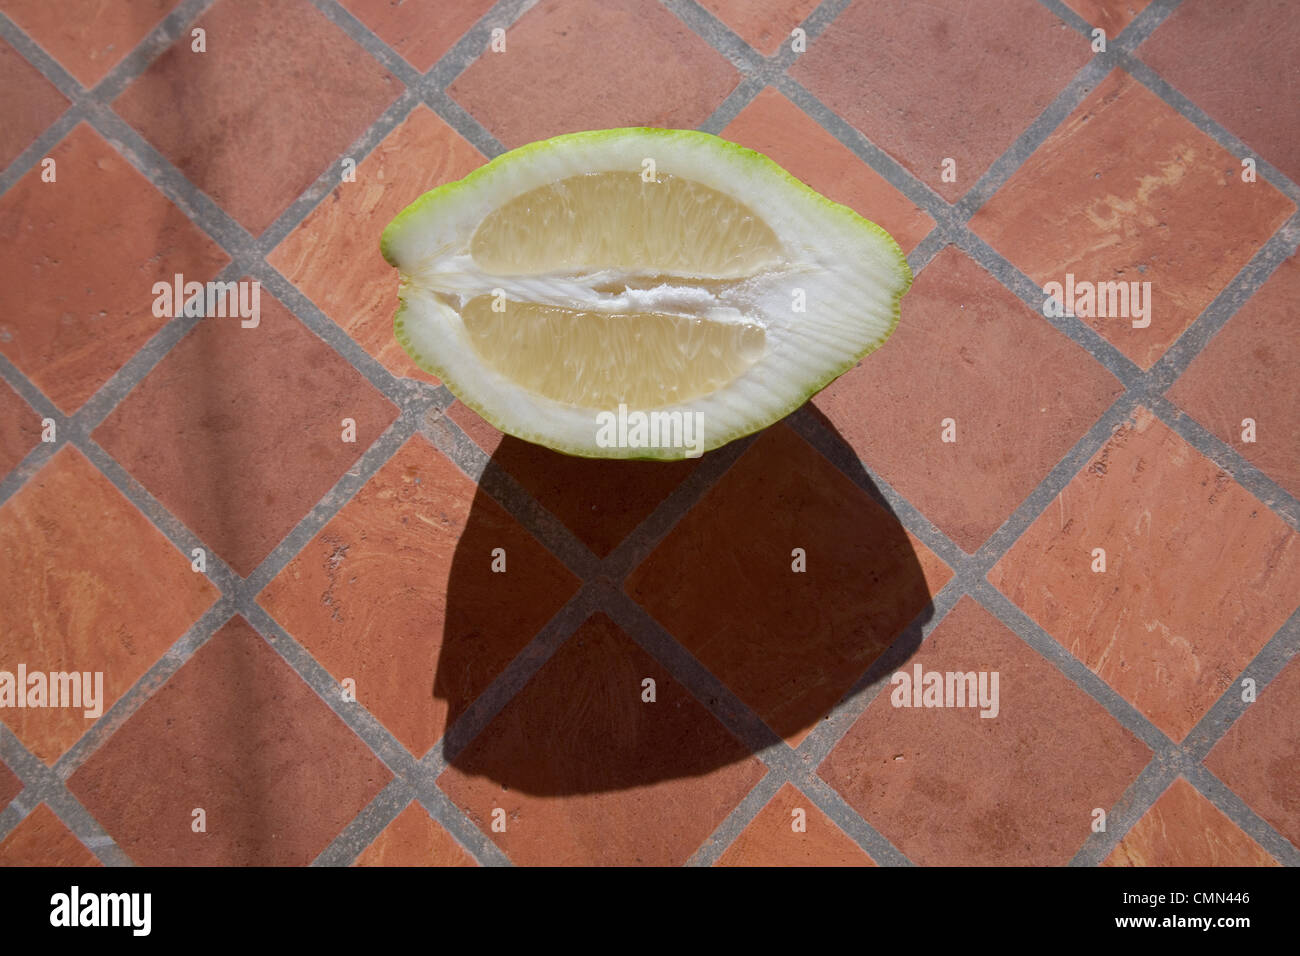 Piastrelle di agrumi immagini piastrelle di agrumi fotos stock